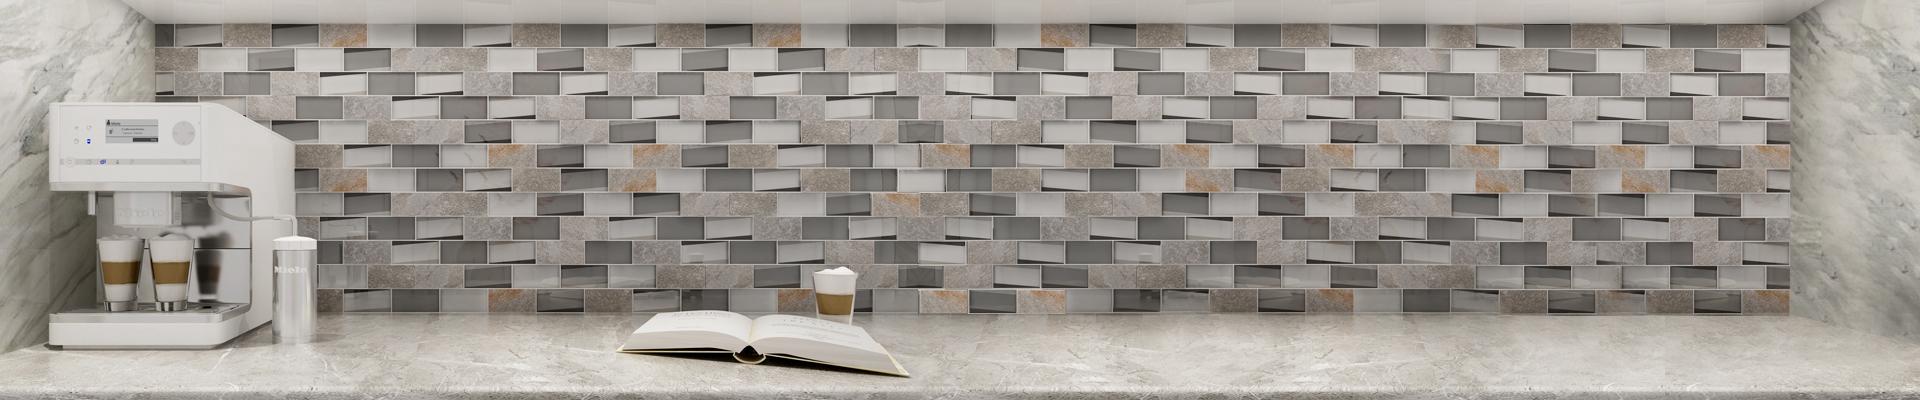 video-sale glass mosaic wall tiles wholesale for kitchen Heng Xing-Heng Xing-img